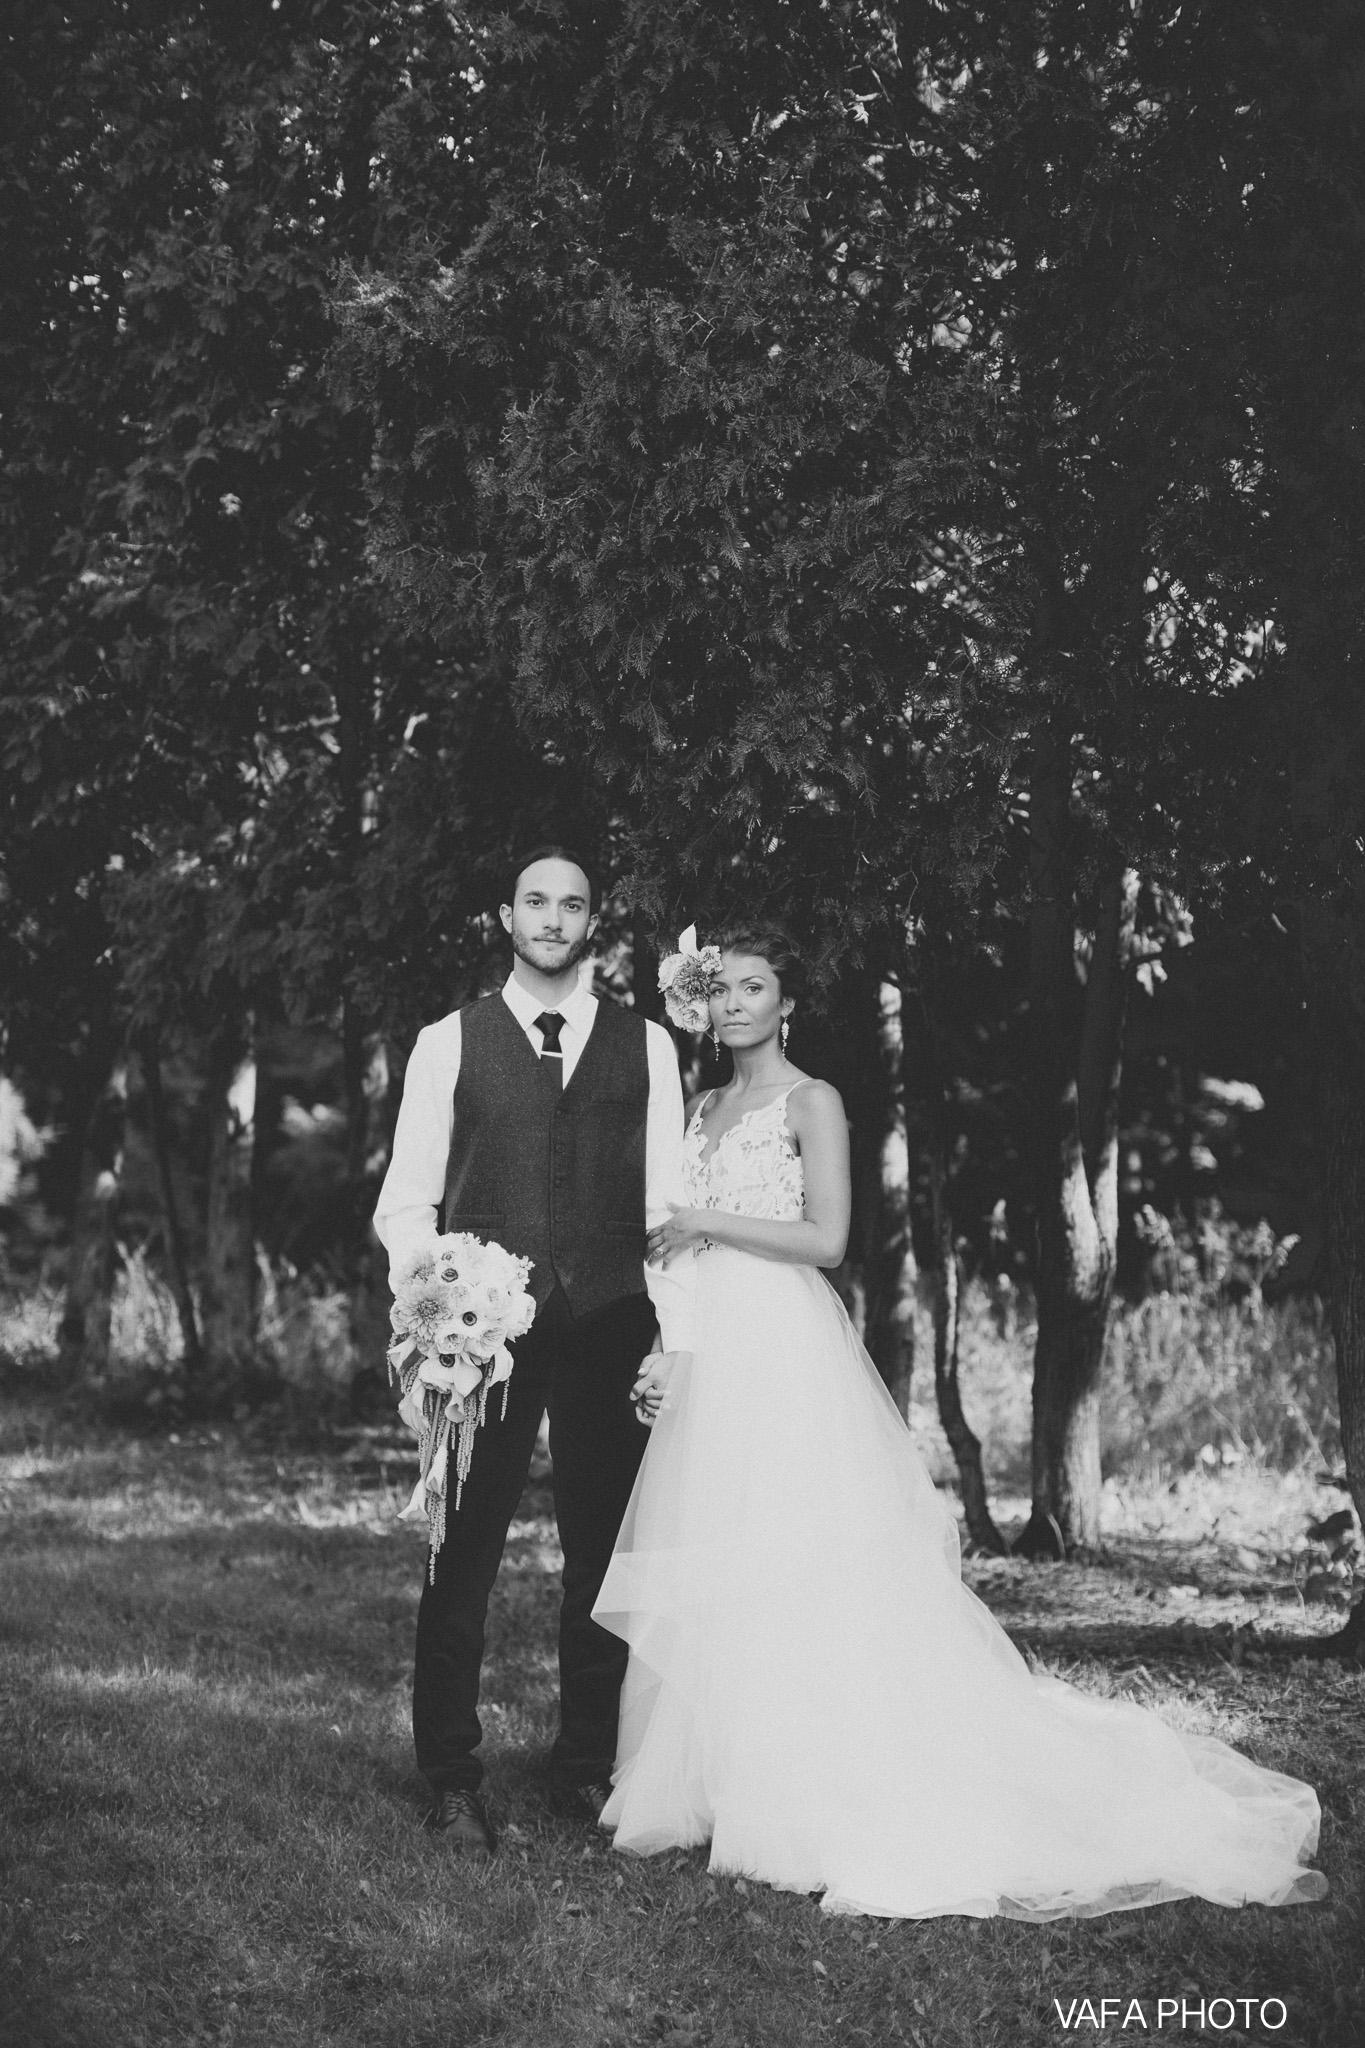 The-Felt-Estate-Wedding-Kailie-David-Vafa-Photo-655.jpg